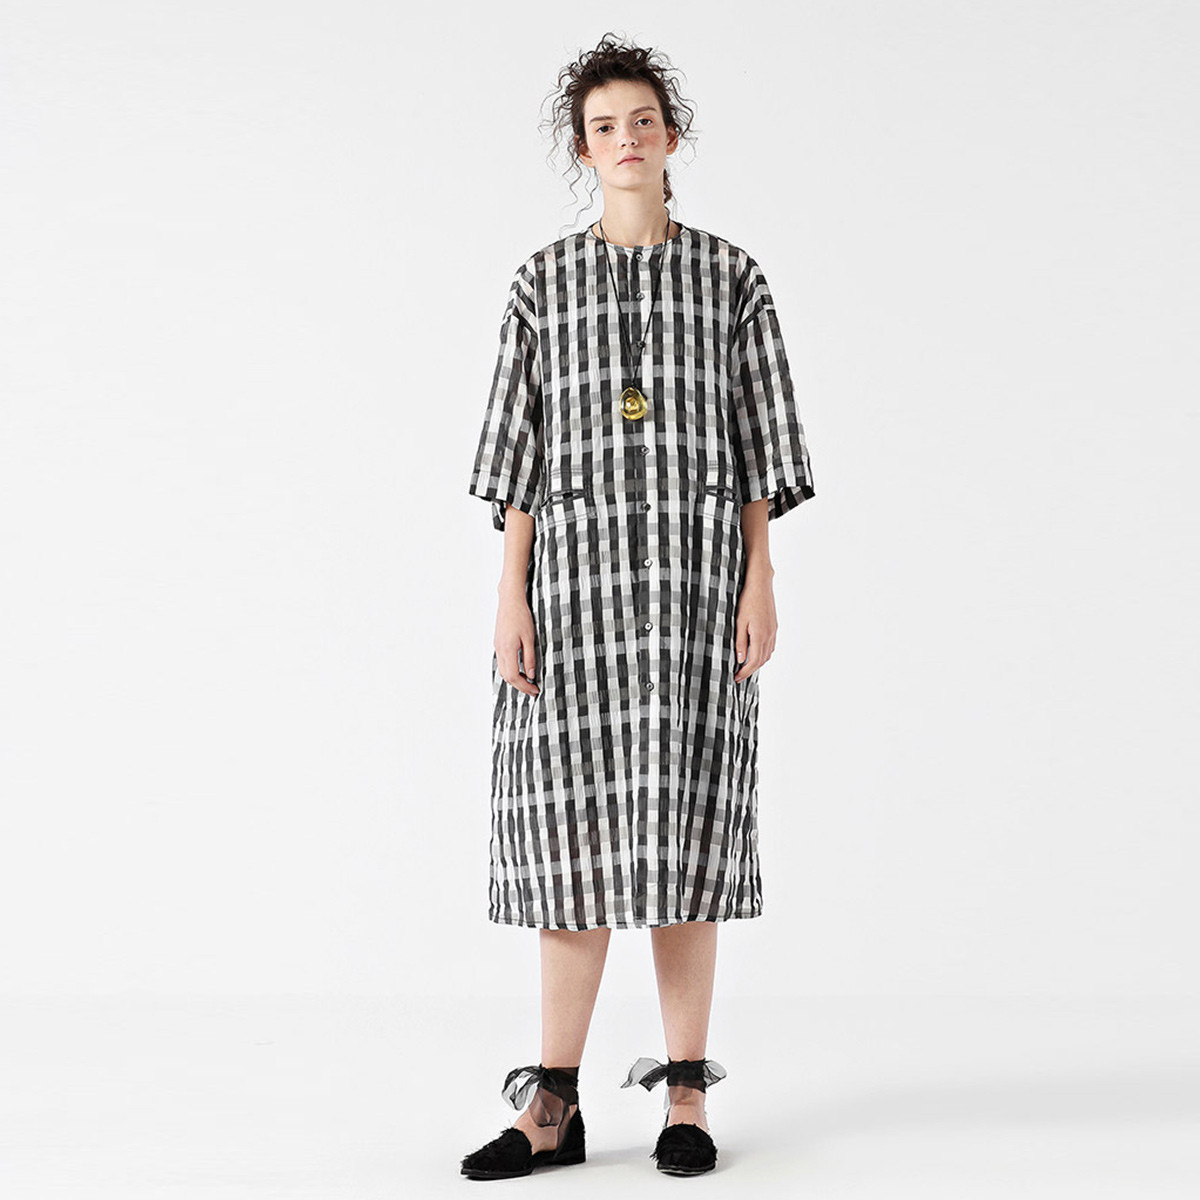 EIN夏季格子茧型外套女复古文艺风轻薄圆领七分袖防晒新款EIN言EH0803021905